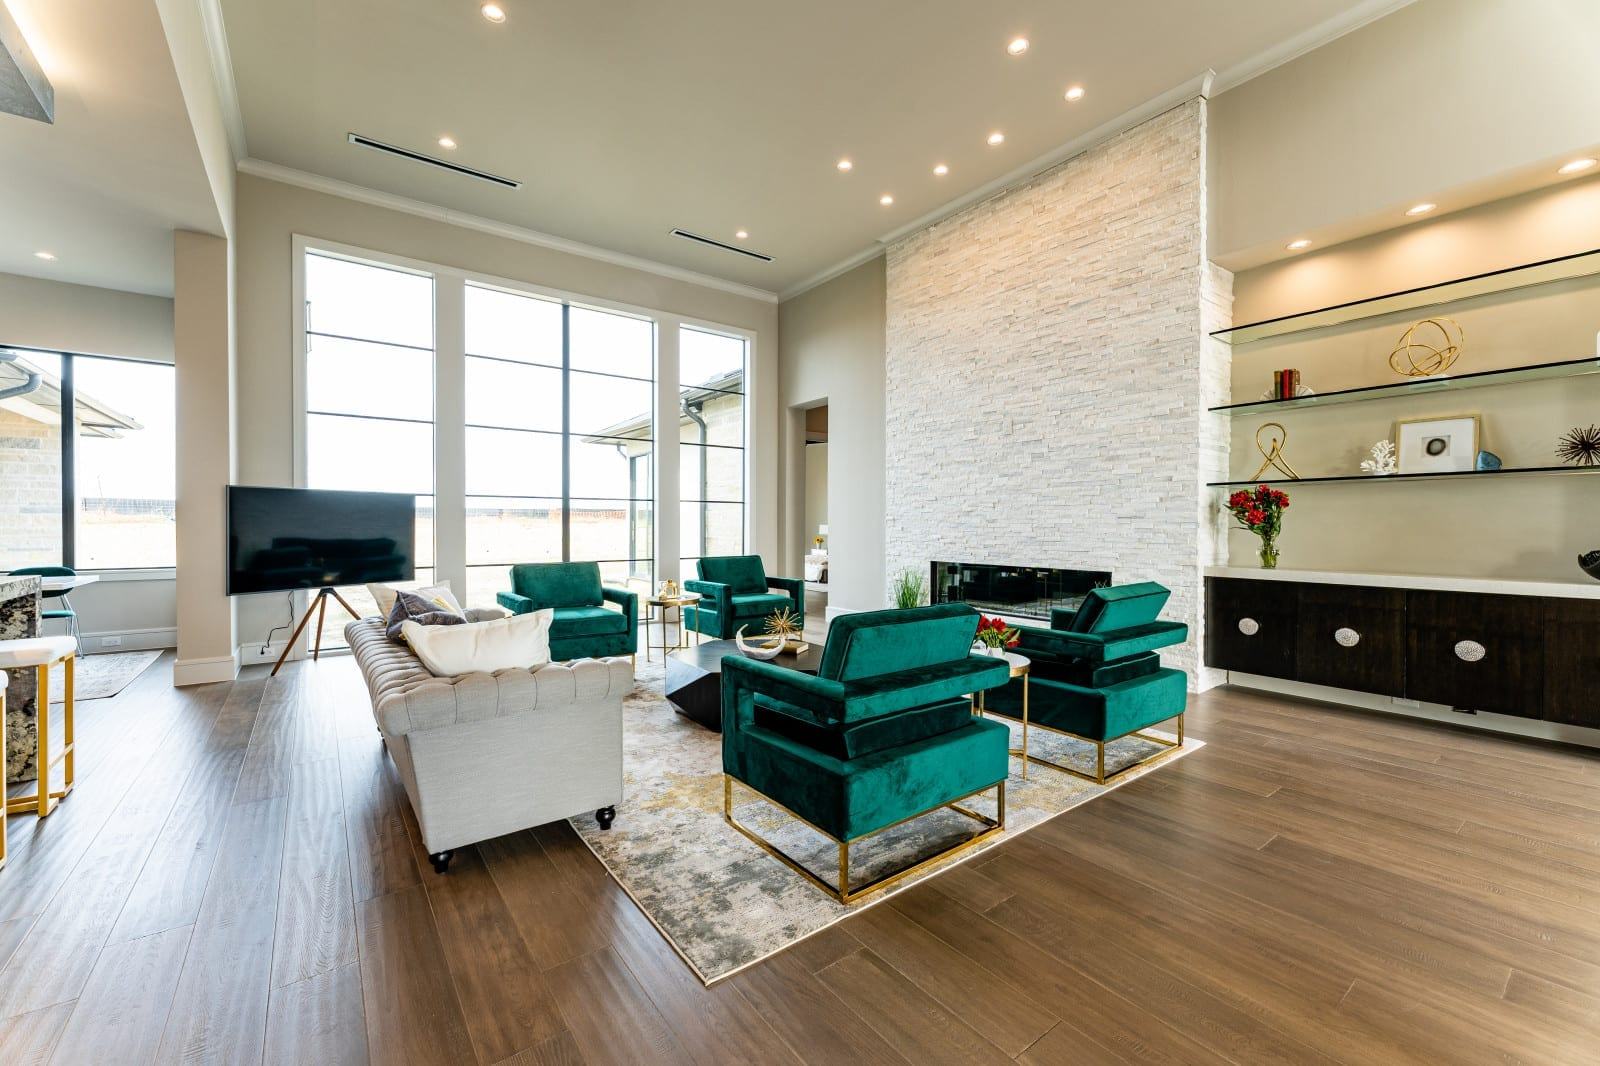 Modern Style Homes design # 10 - Millennial Design + Build